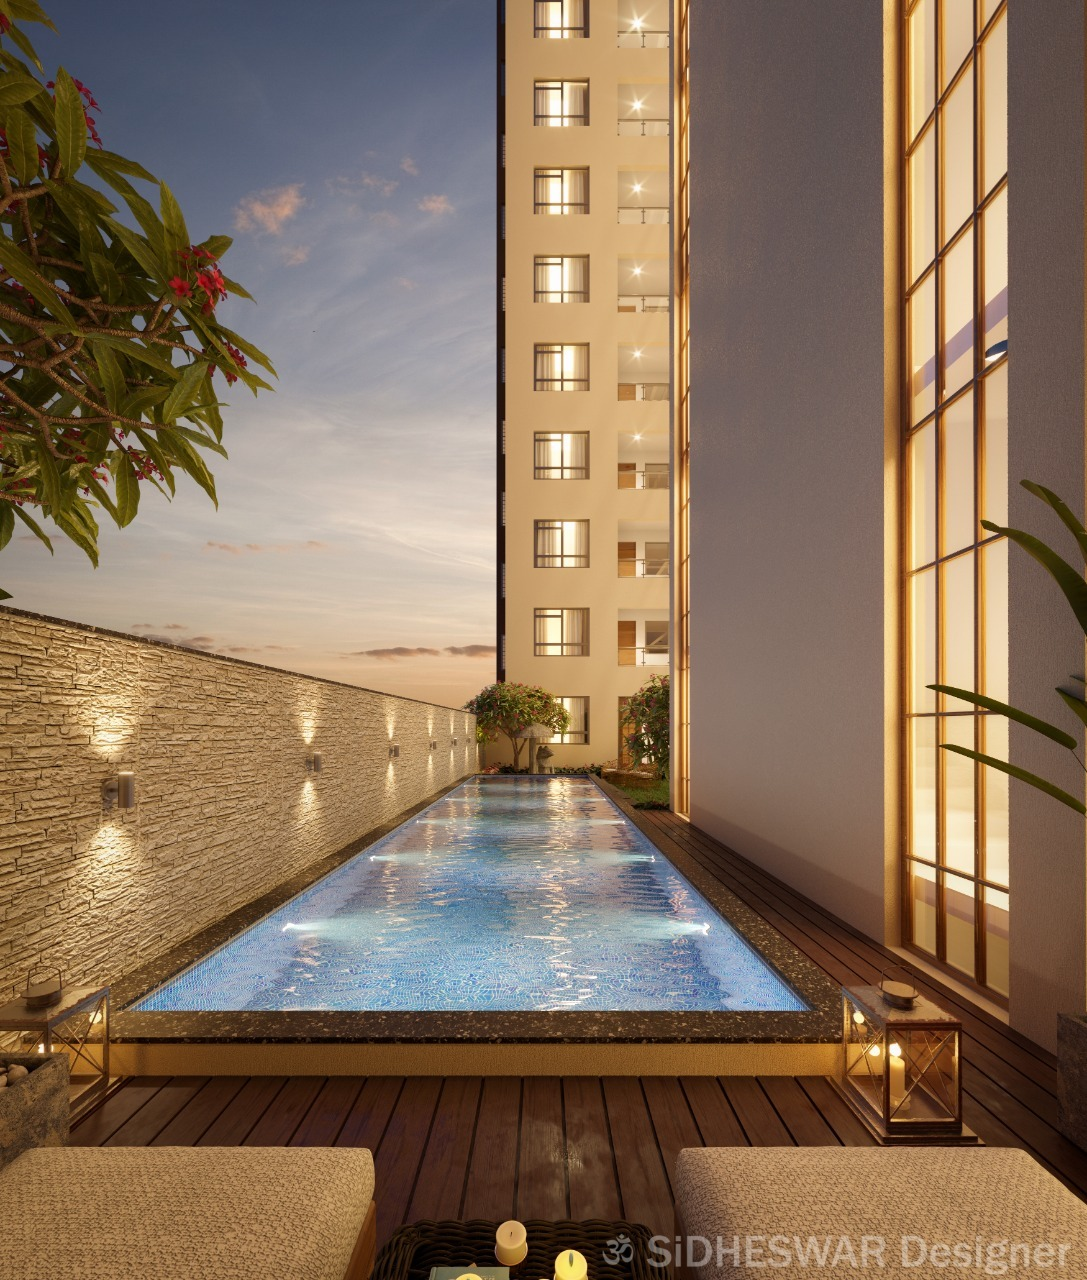 New 2 Bedroom Apartments for sale in Kileleshwa